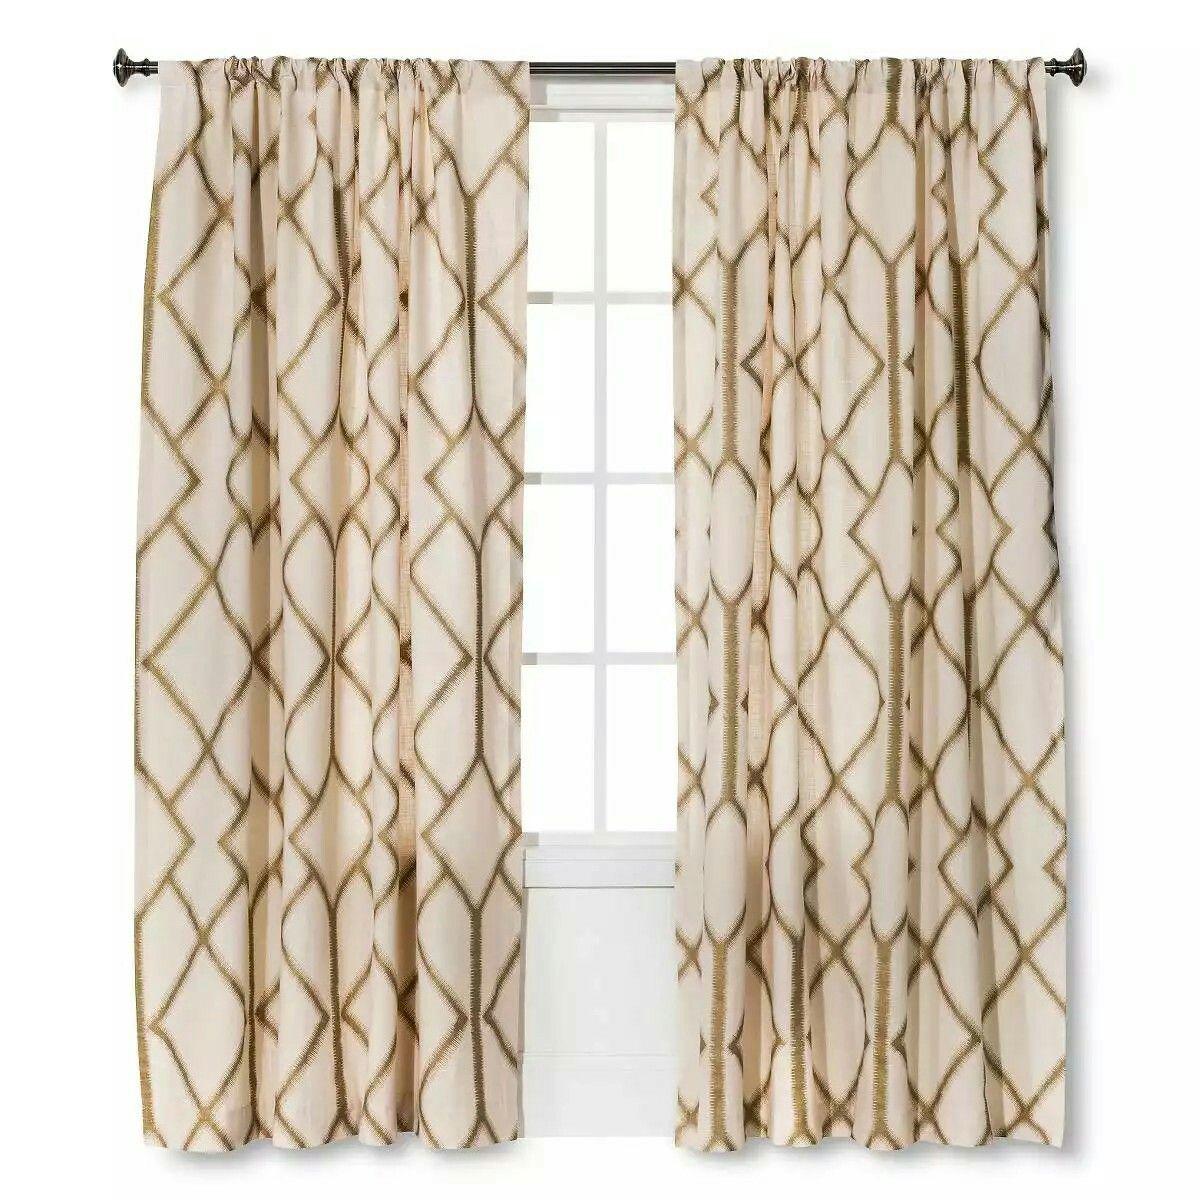 New Trends Curtain Panels Living Room Decor Farmhouse Style Dining Curtains Shangri La Metallic Target Looks